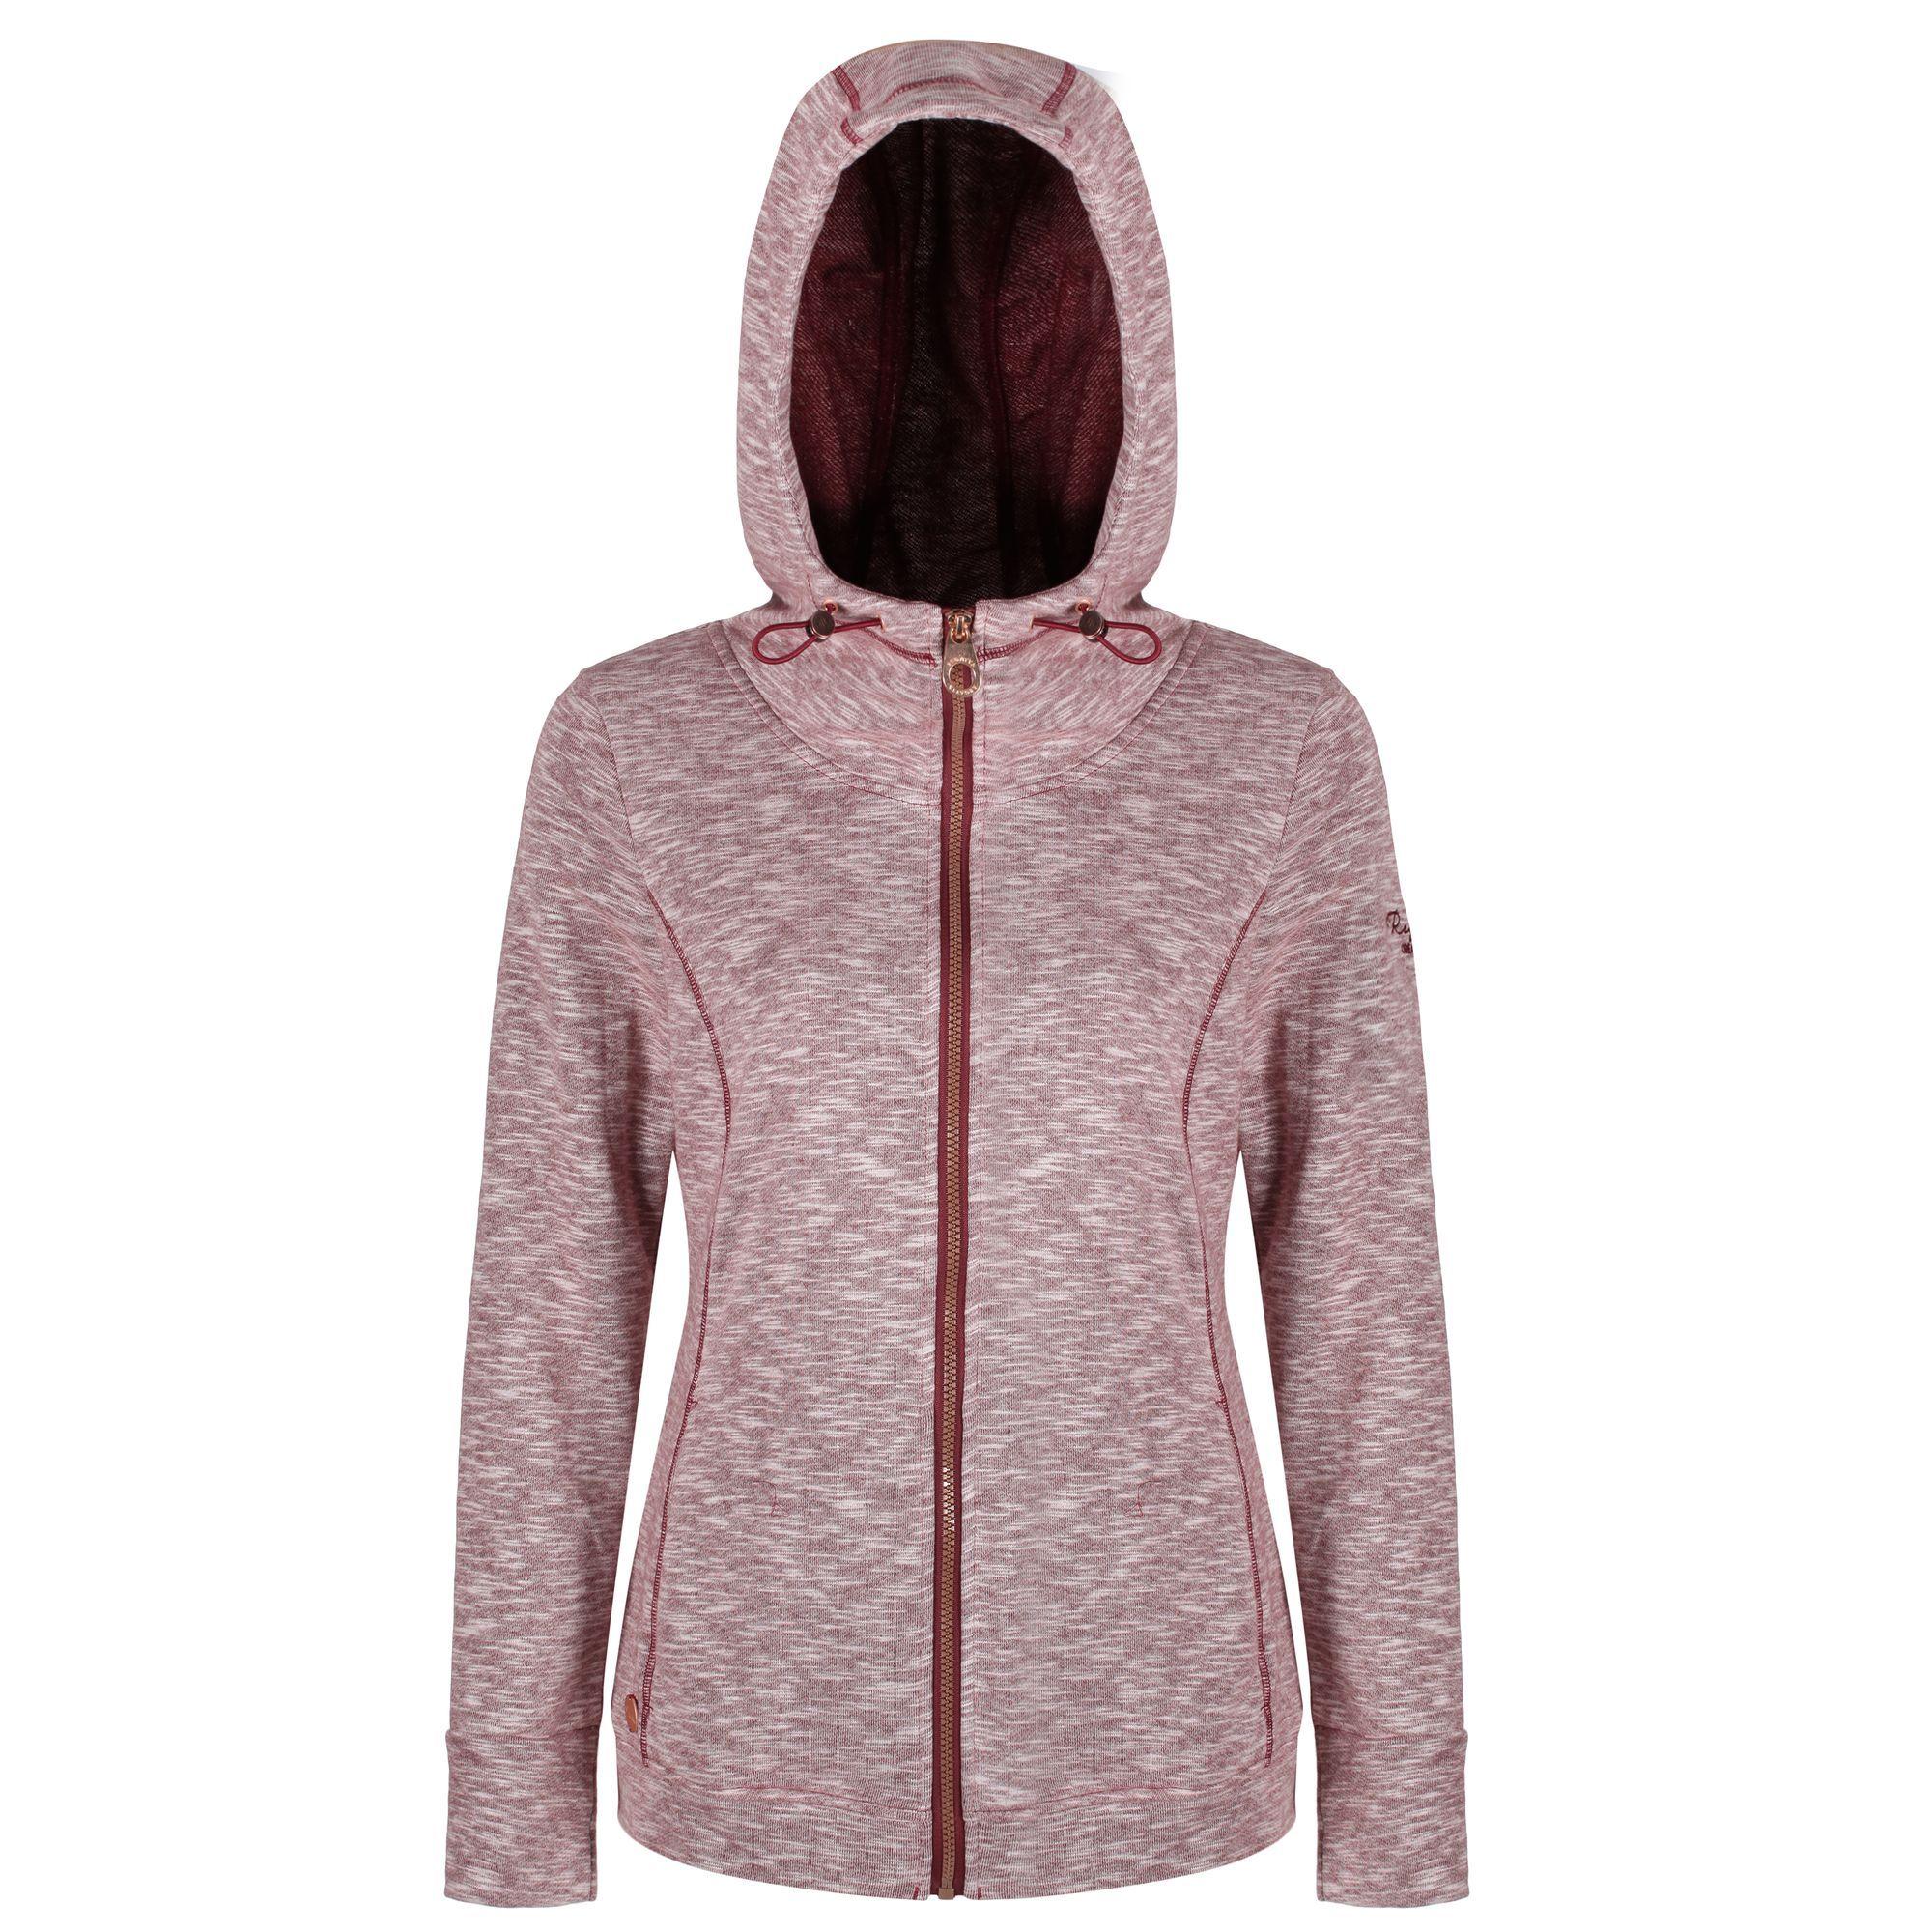 Regatta-Ramosa-Womens-Full-Zip-Hoodie-Hooded-Fleece-Jacket-RRP-50 thumbnail 4